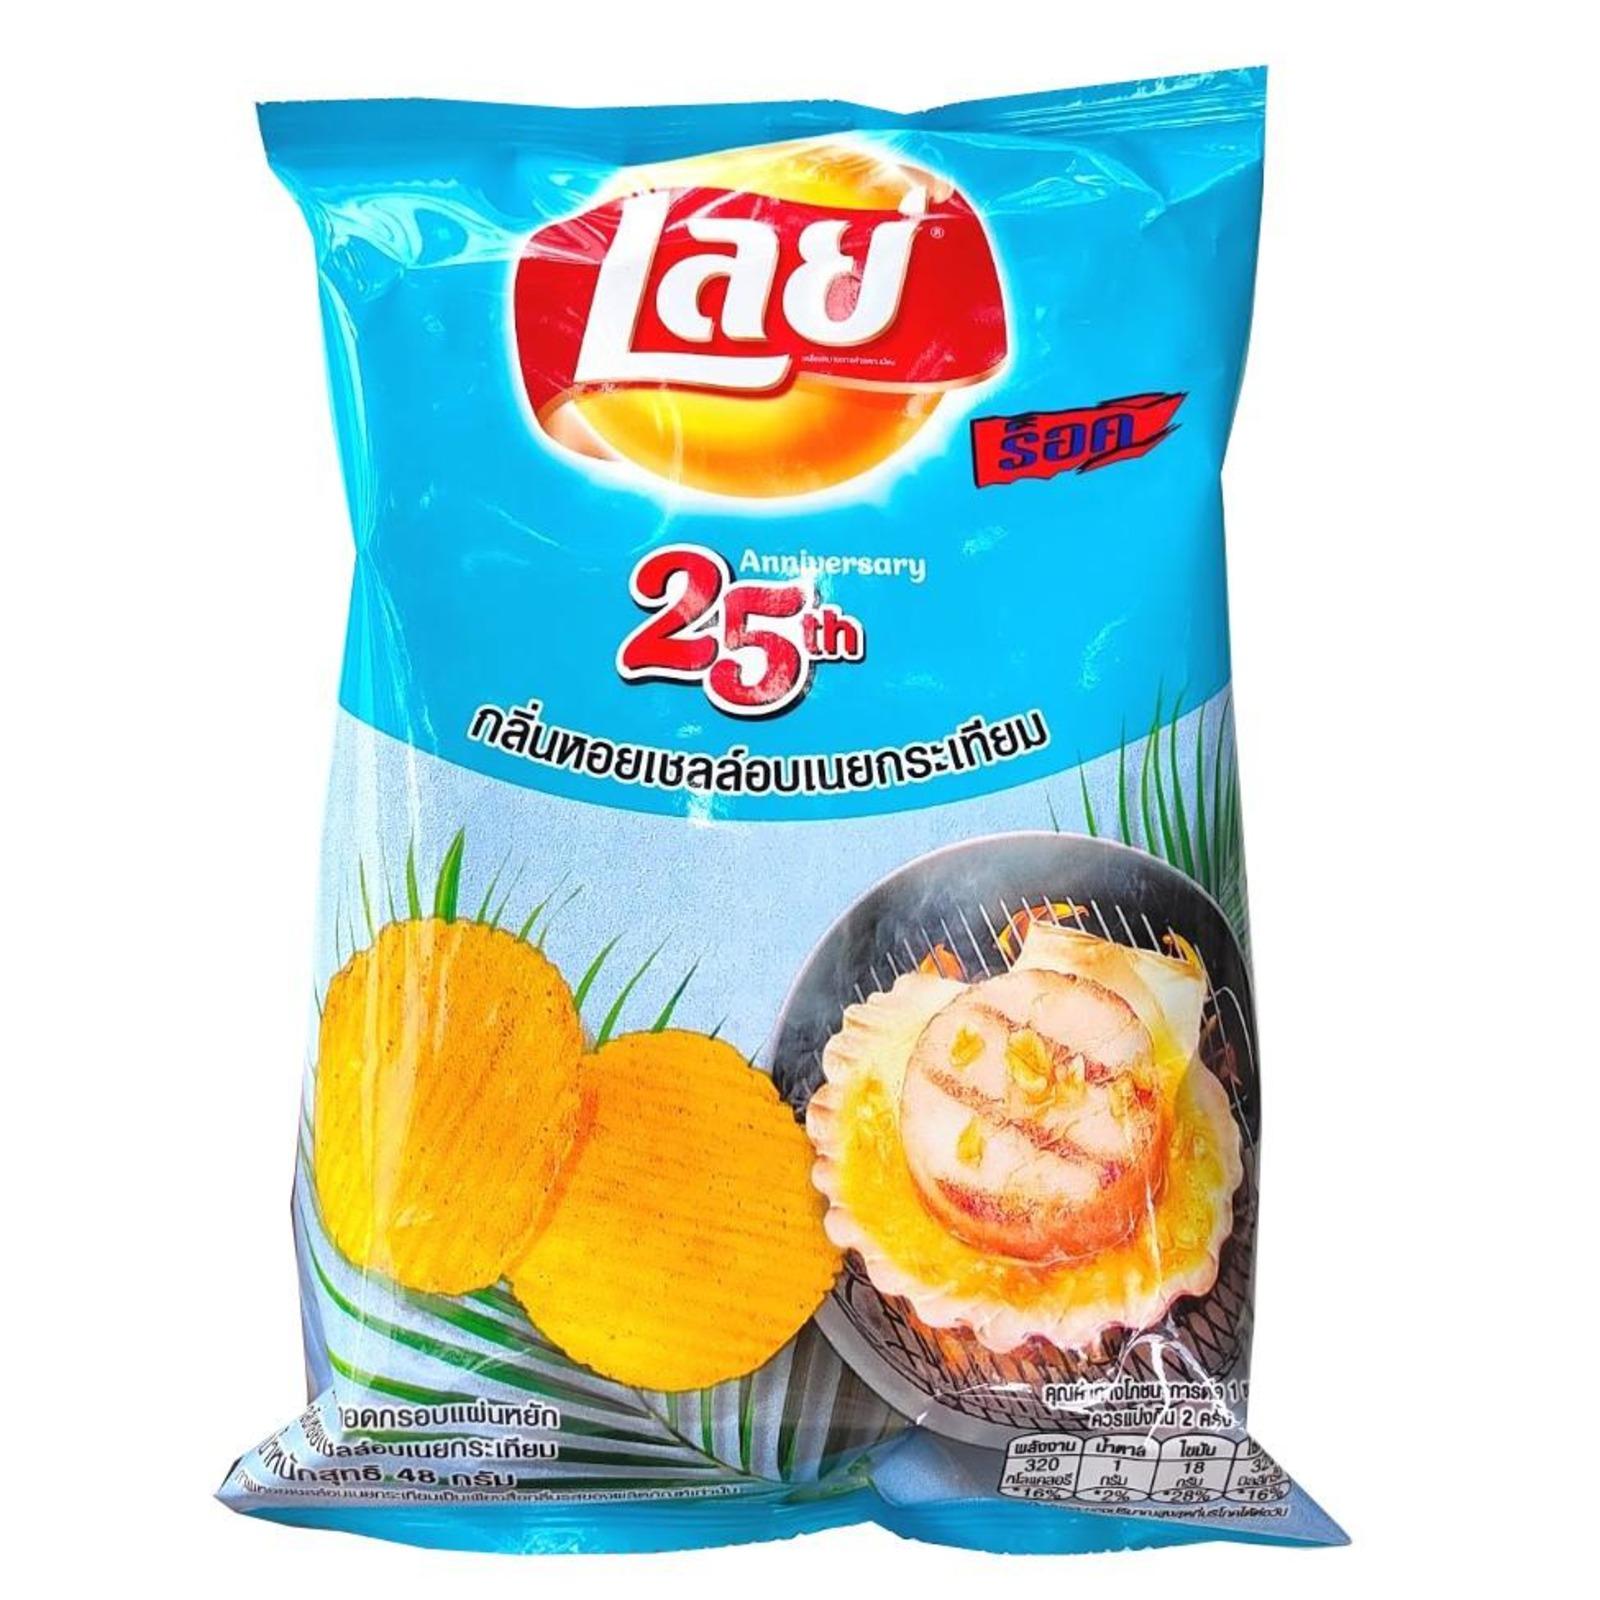 Lays Potato Chips Butter Garlic Scallop 48g